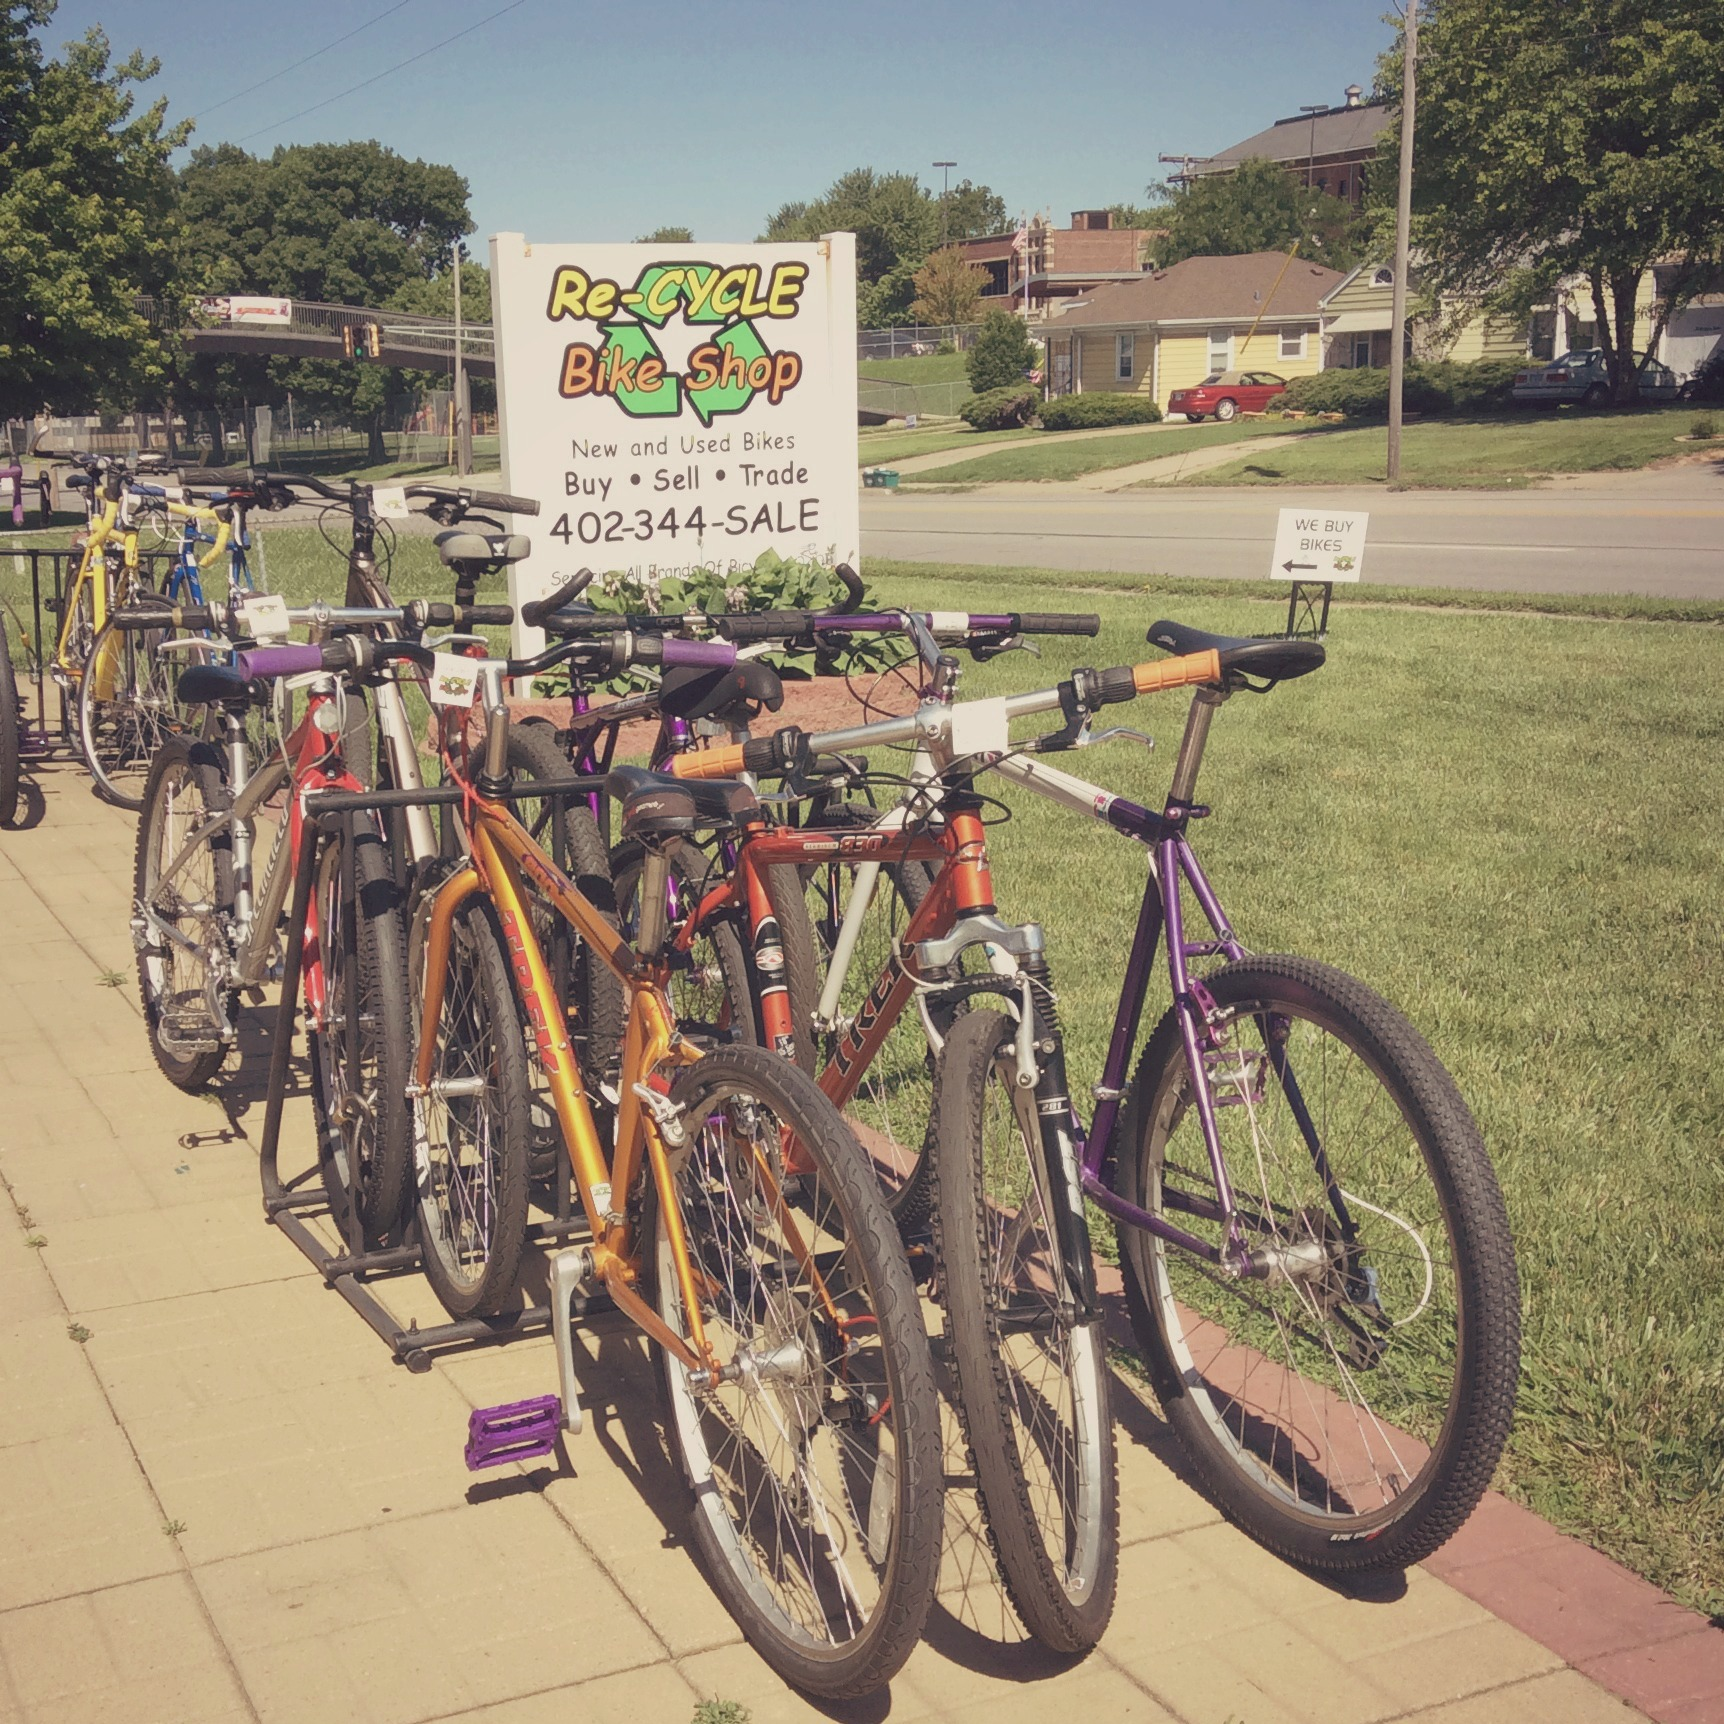 Re-Cycle Bike Shop